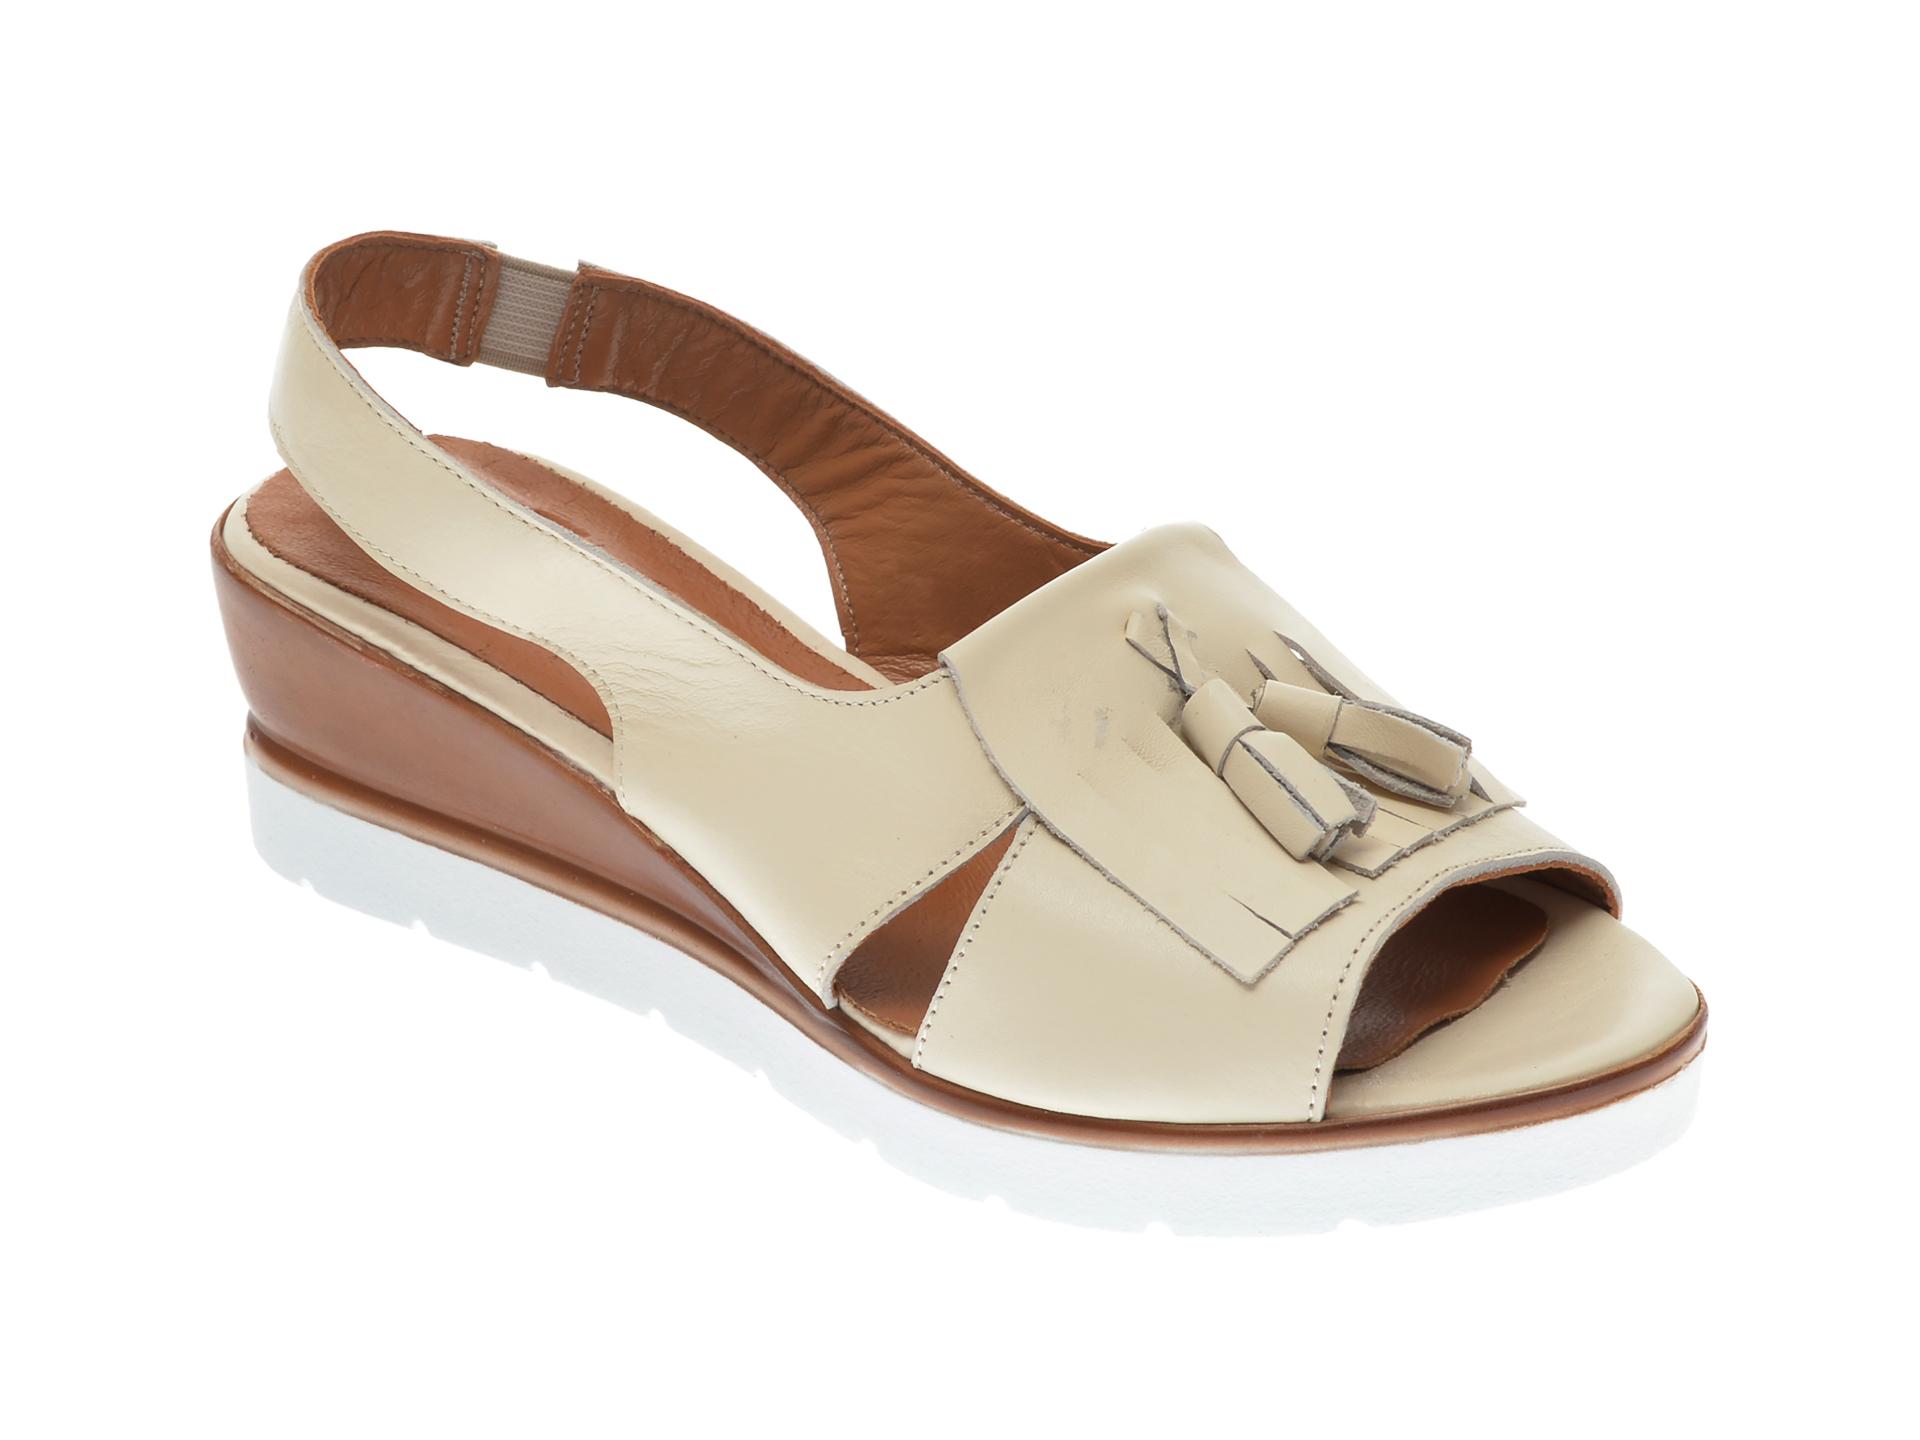 Sandale FLAVIA PASSINI bej, 20608, din piele naturala